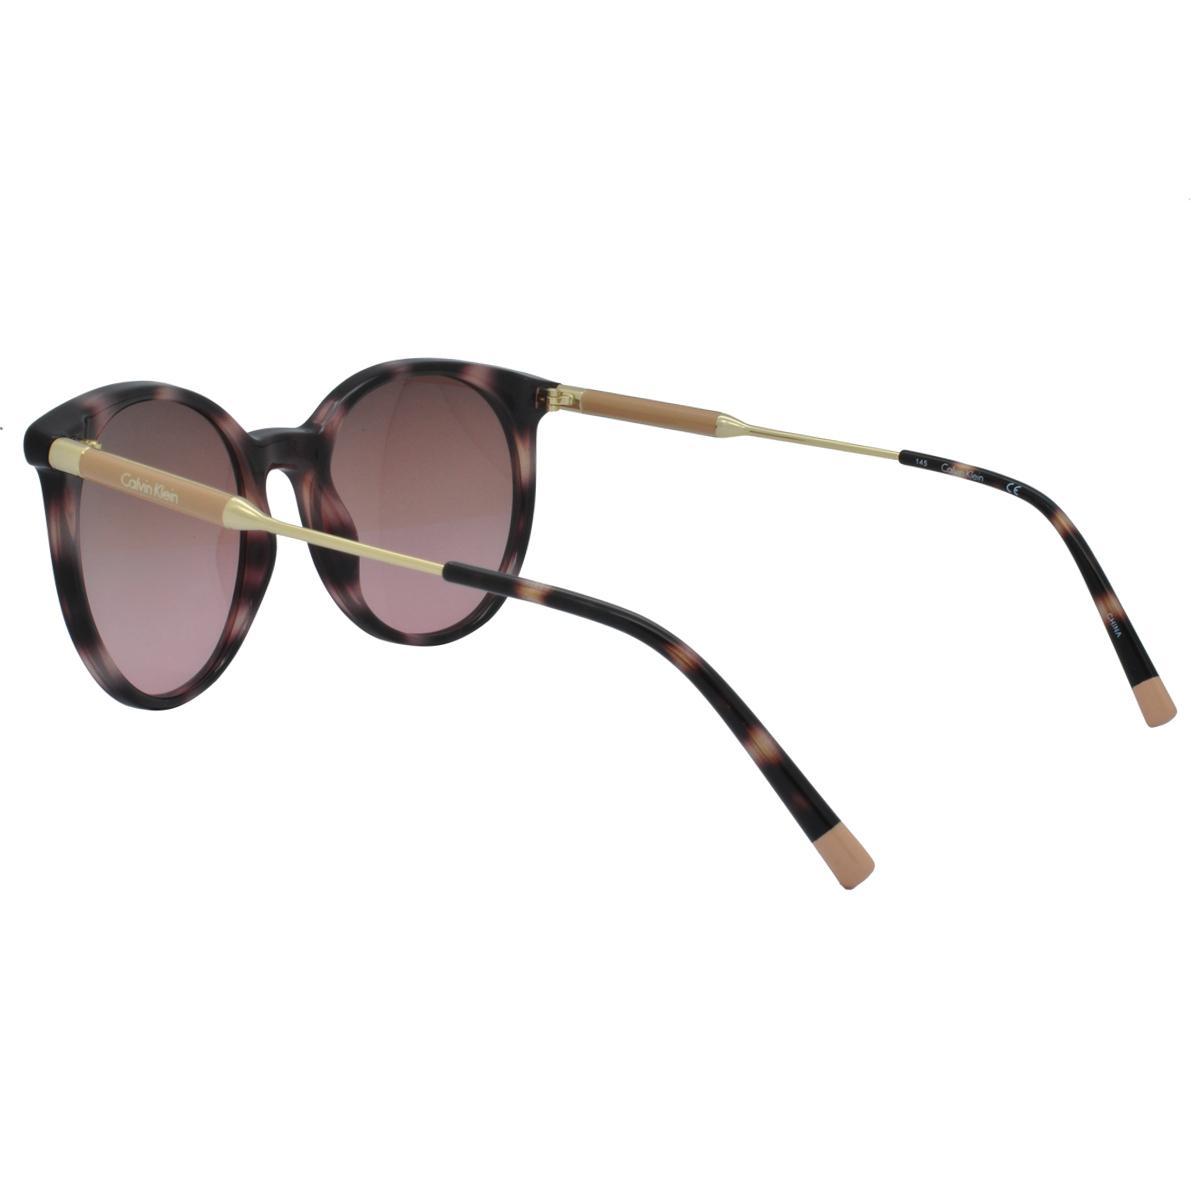 90ceaa39521ad Óculos de Sol Calvin Klein Feminino CK3208S 669 - Acetato Tartaruga Marrom  e Lente Marrom Degradê R  691